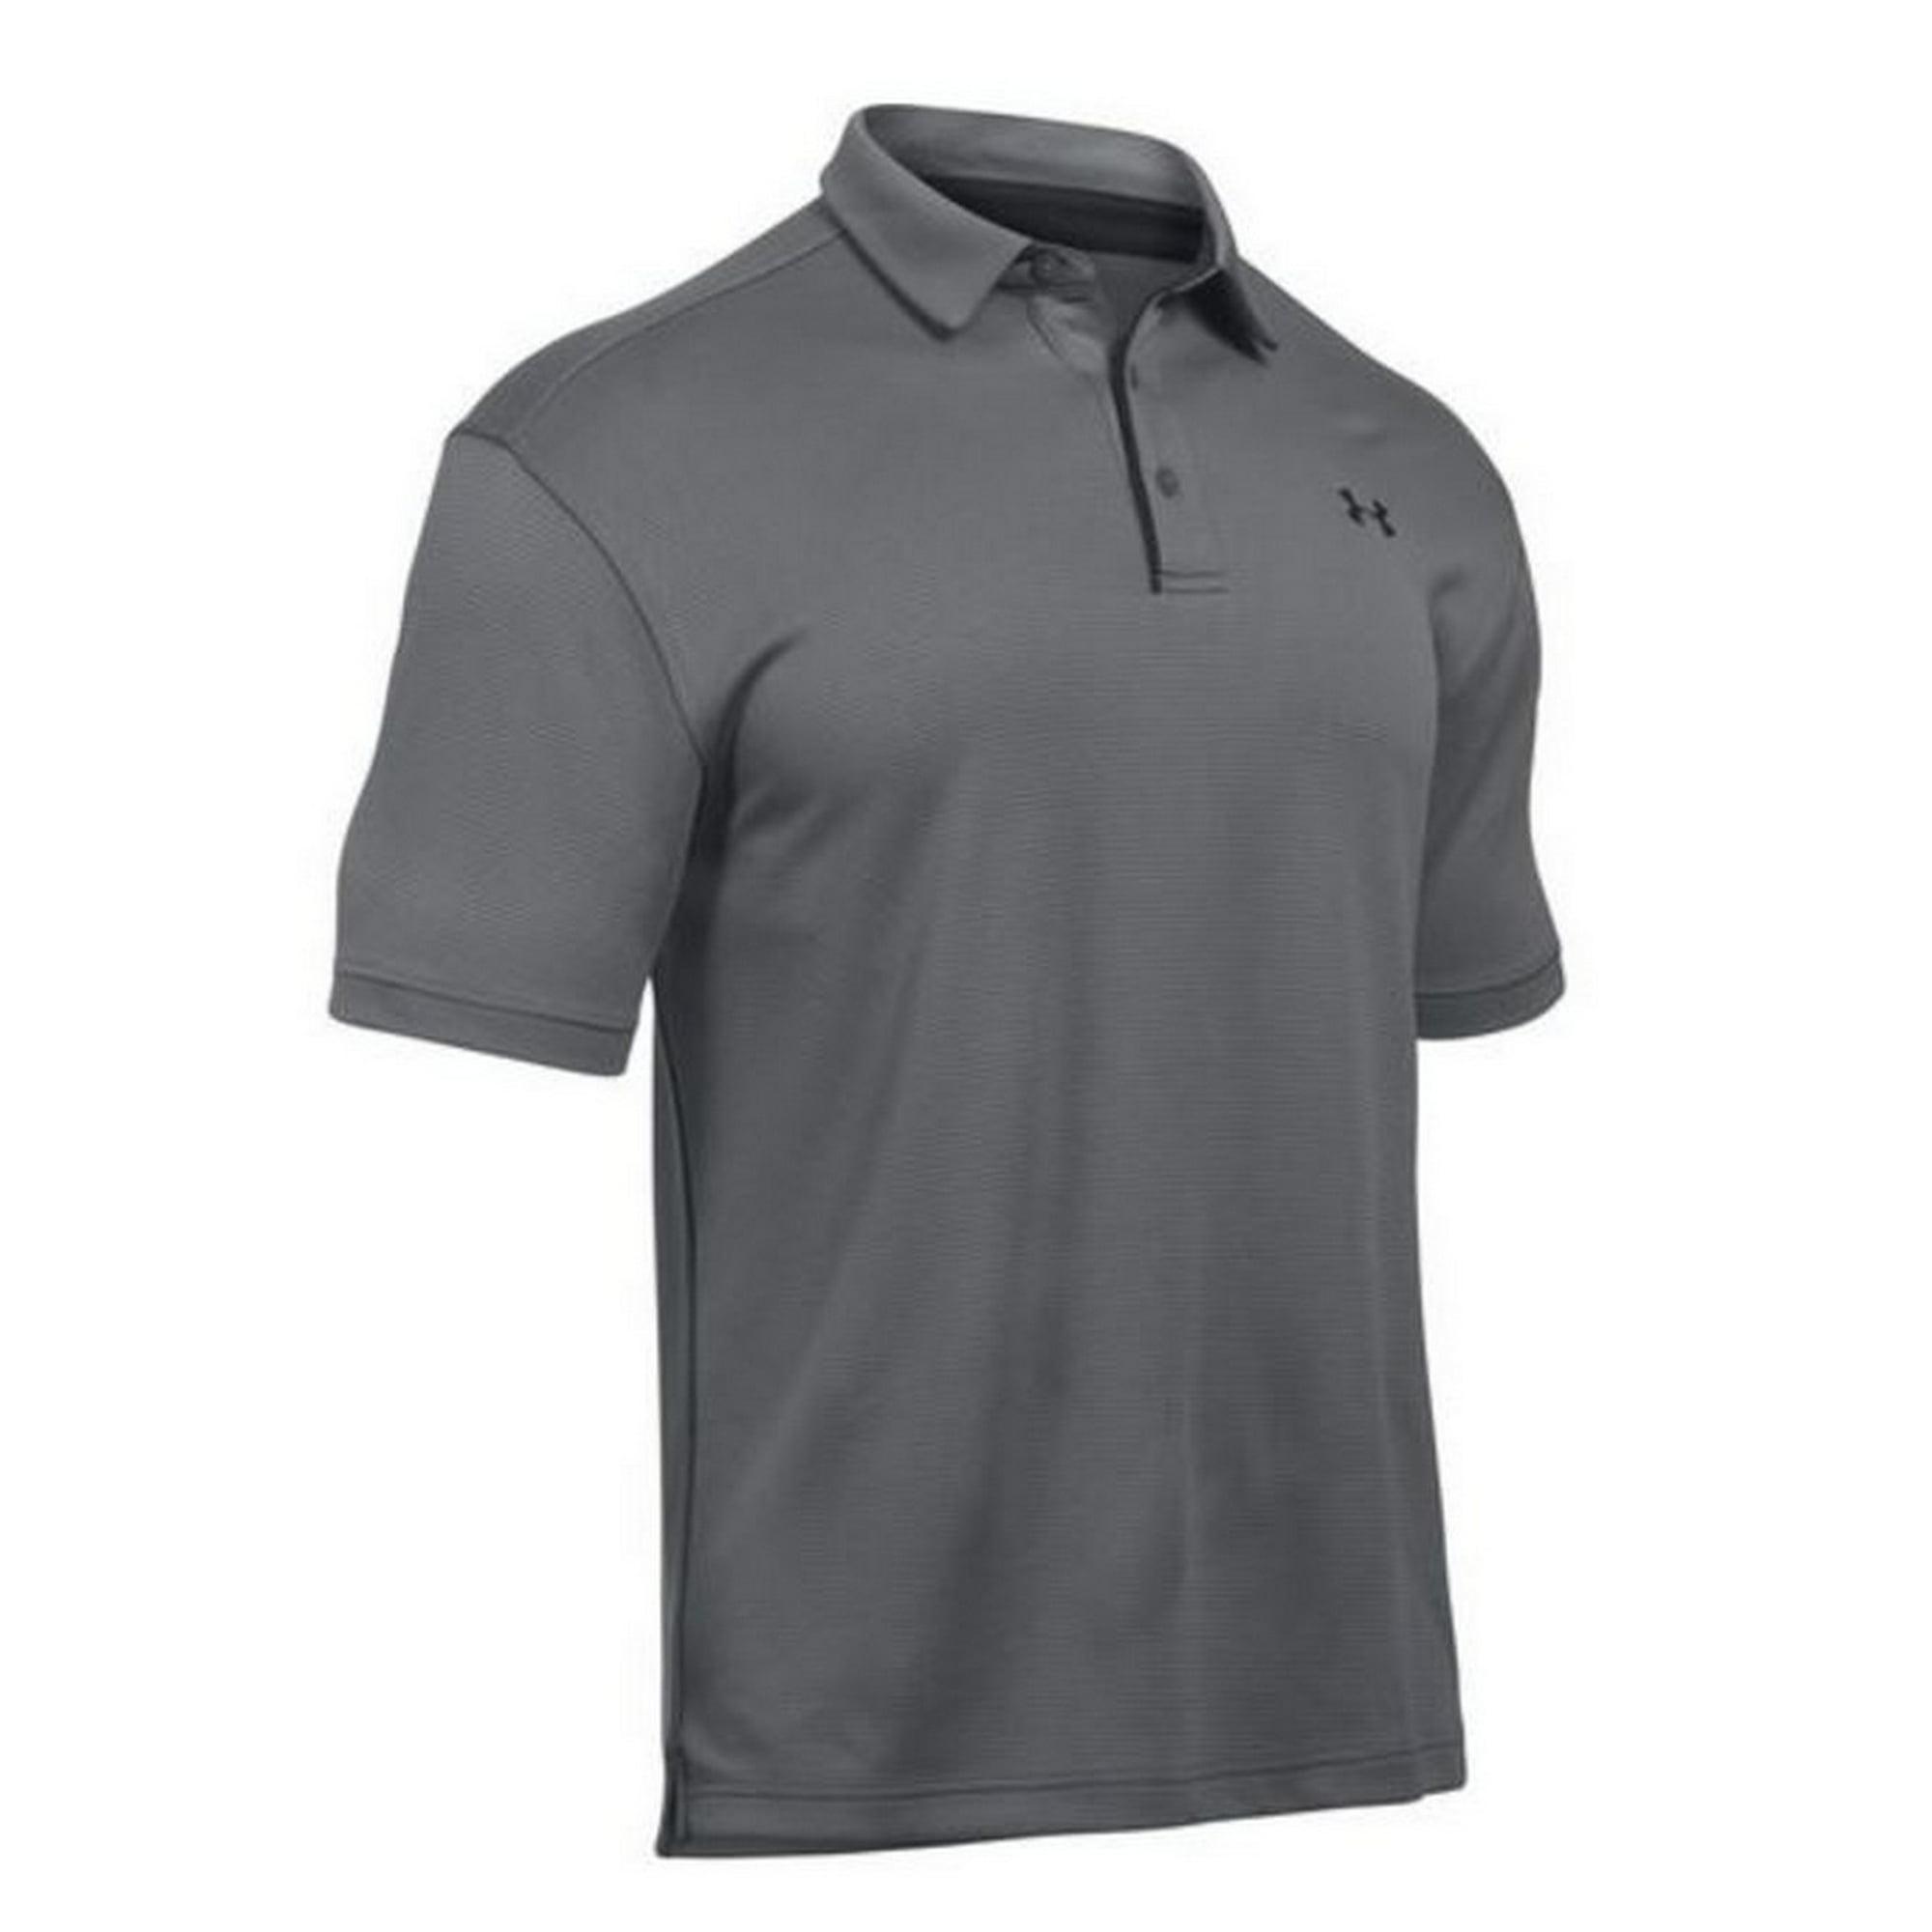 eea7ef2f216f0 Buy Under Armour UA Men s Tech Ribbed Golf Polo Shirt 1290140 ...